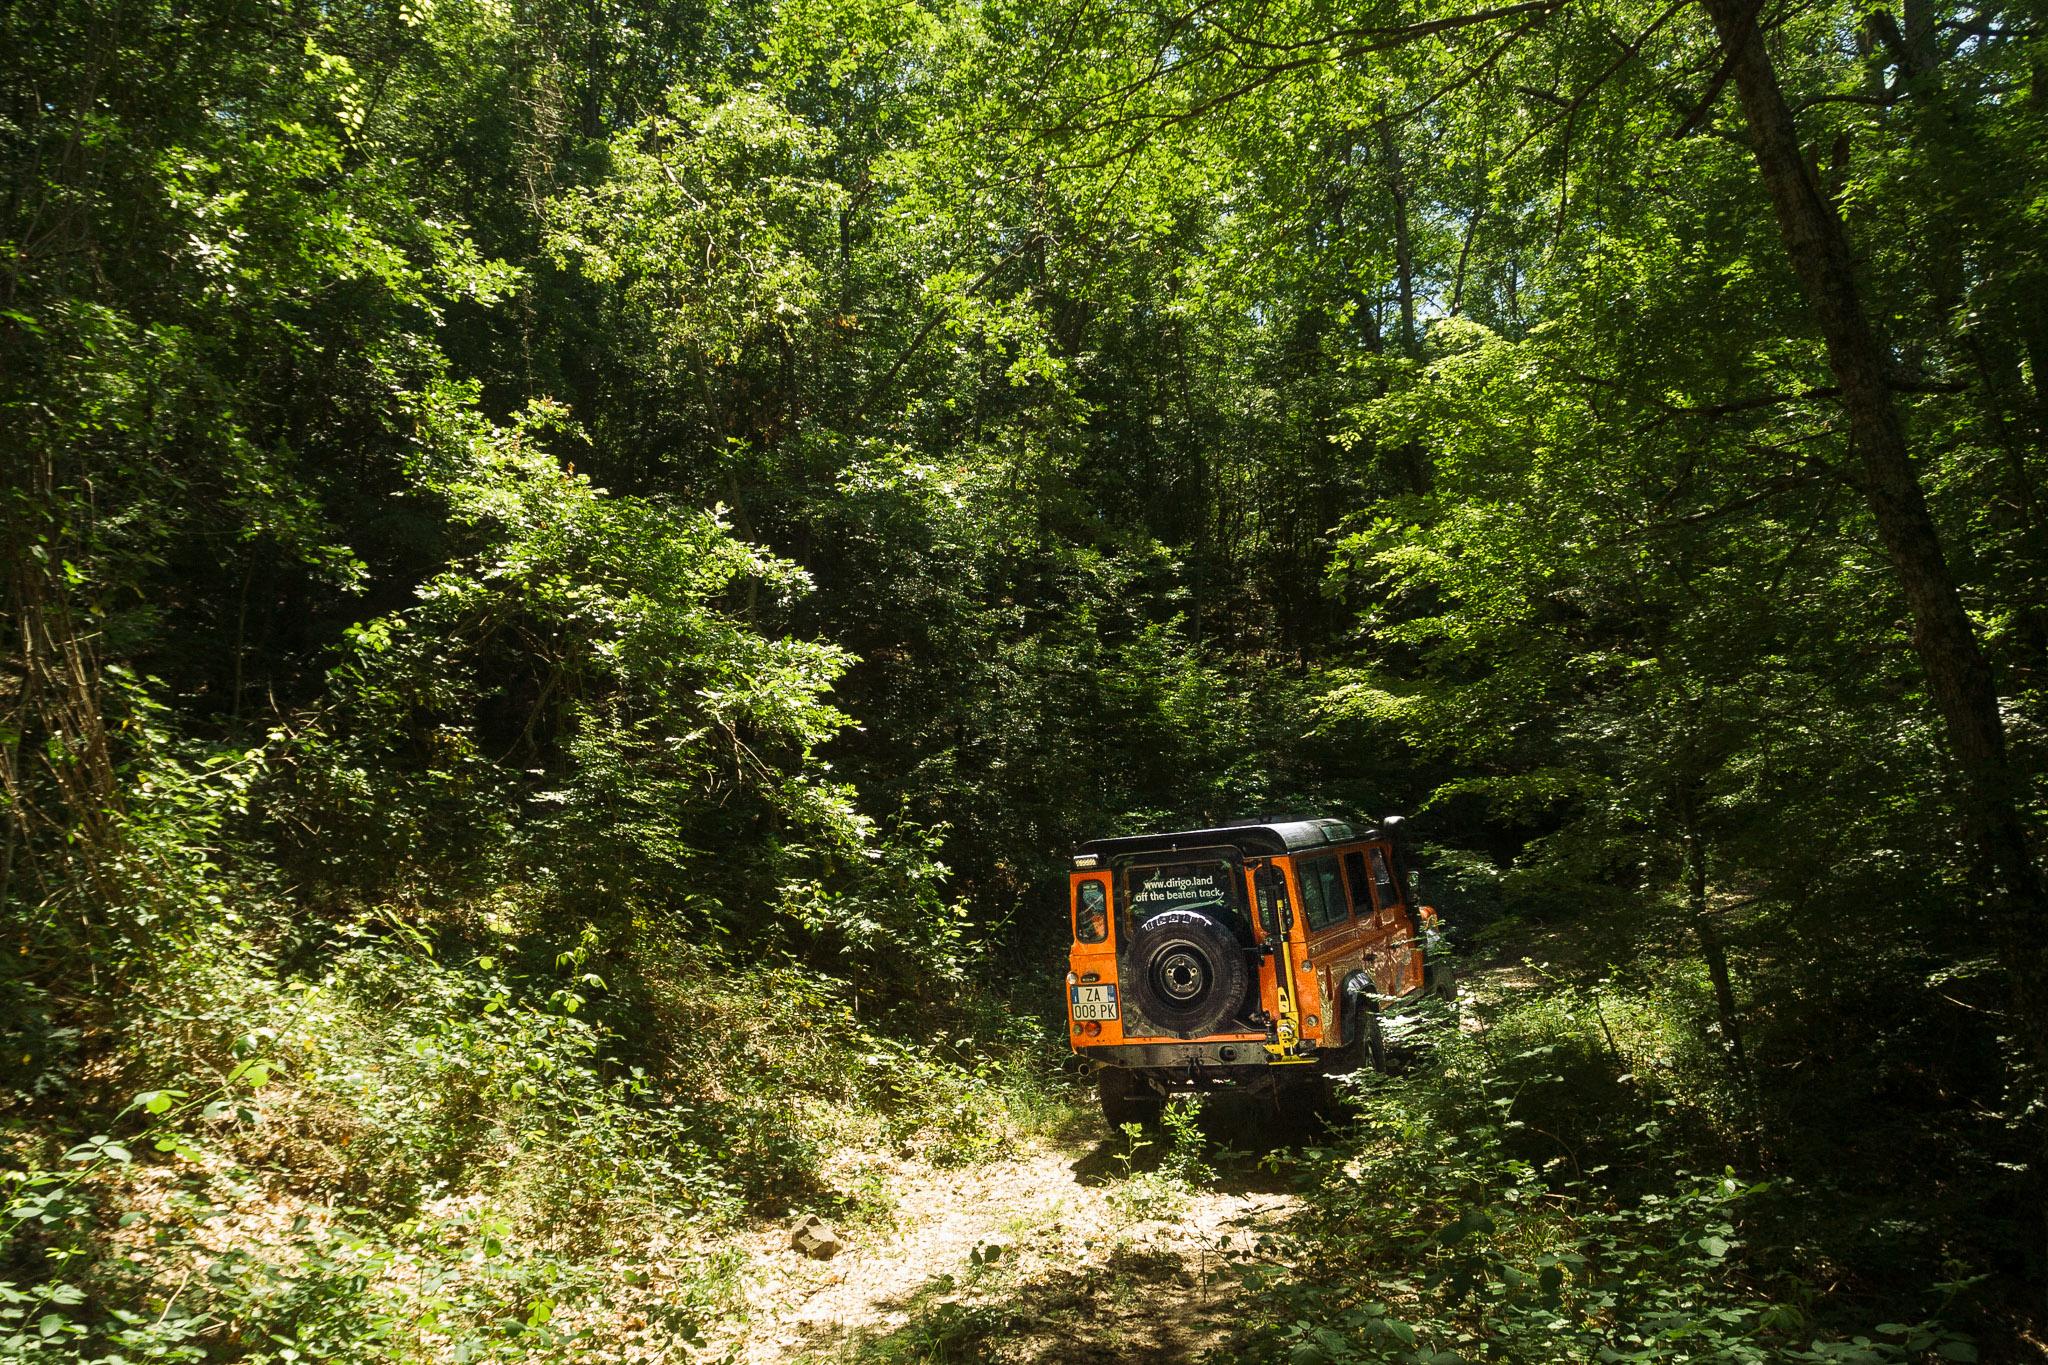 Dirigo Defender 110 entering the woods